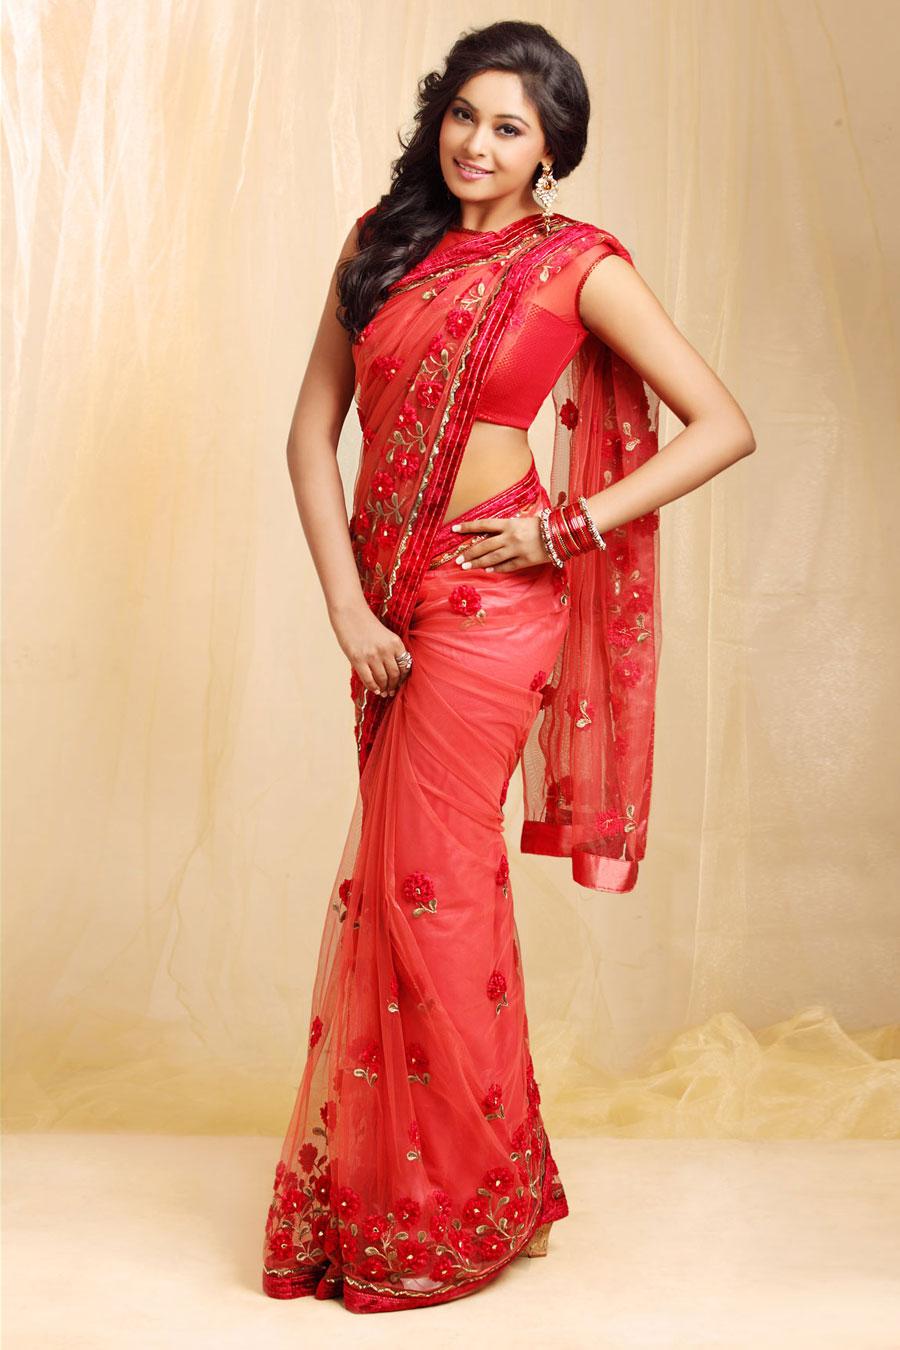 arunthathi actress pics